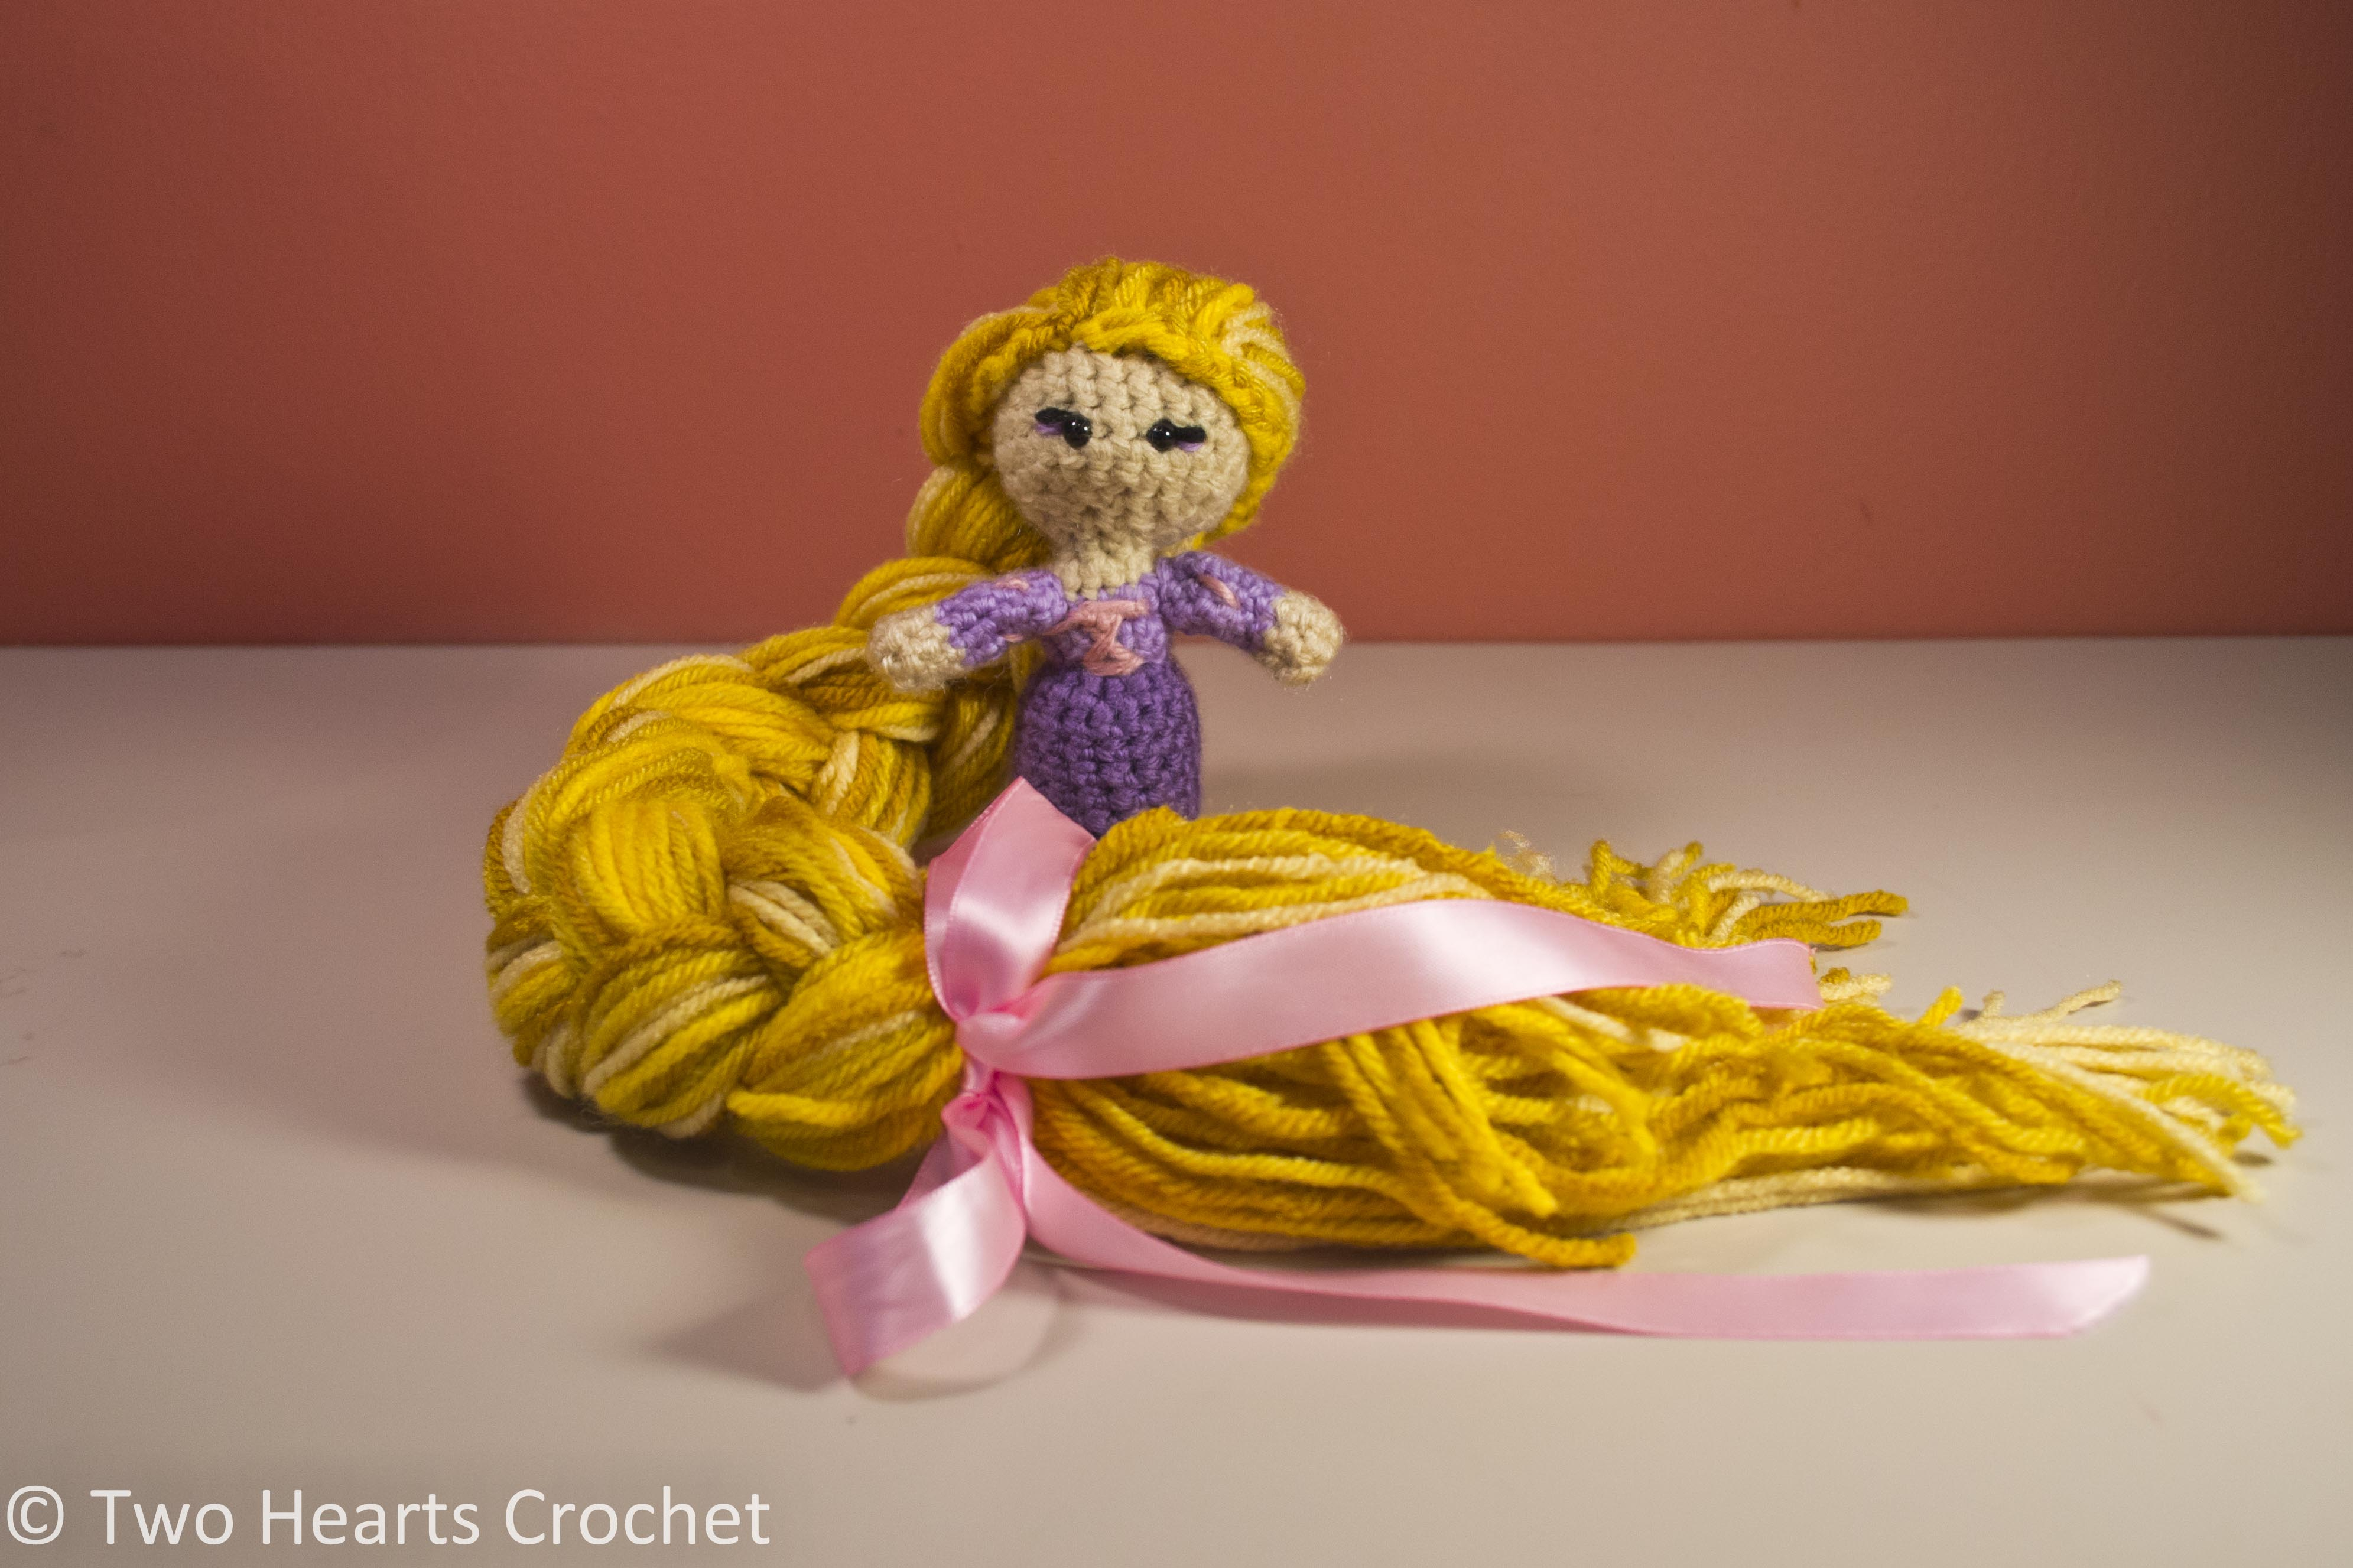 Amigurumi Star Wars Patrones Gratis : Princess Pattern: Rapunzel (Tangled) Amigurumi Two ...